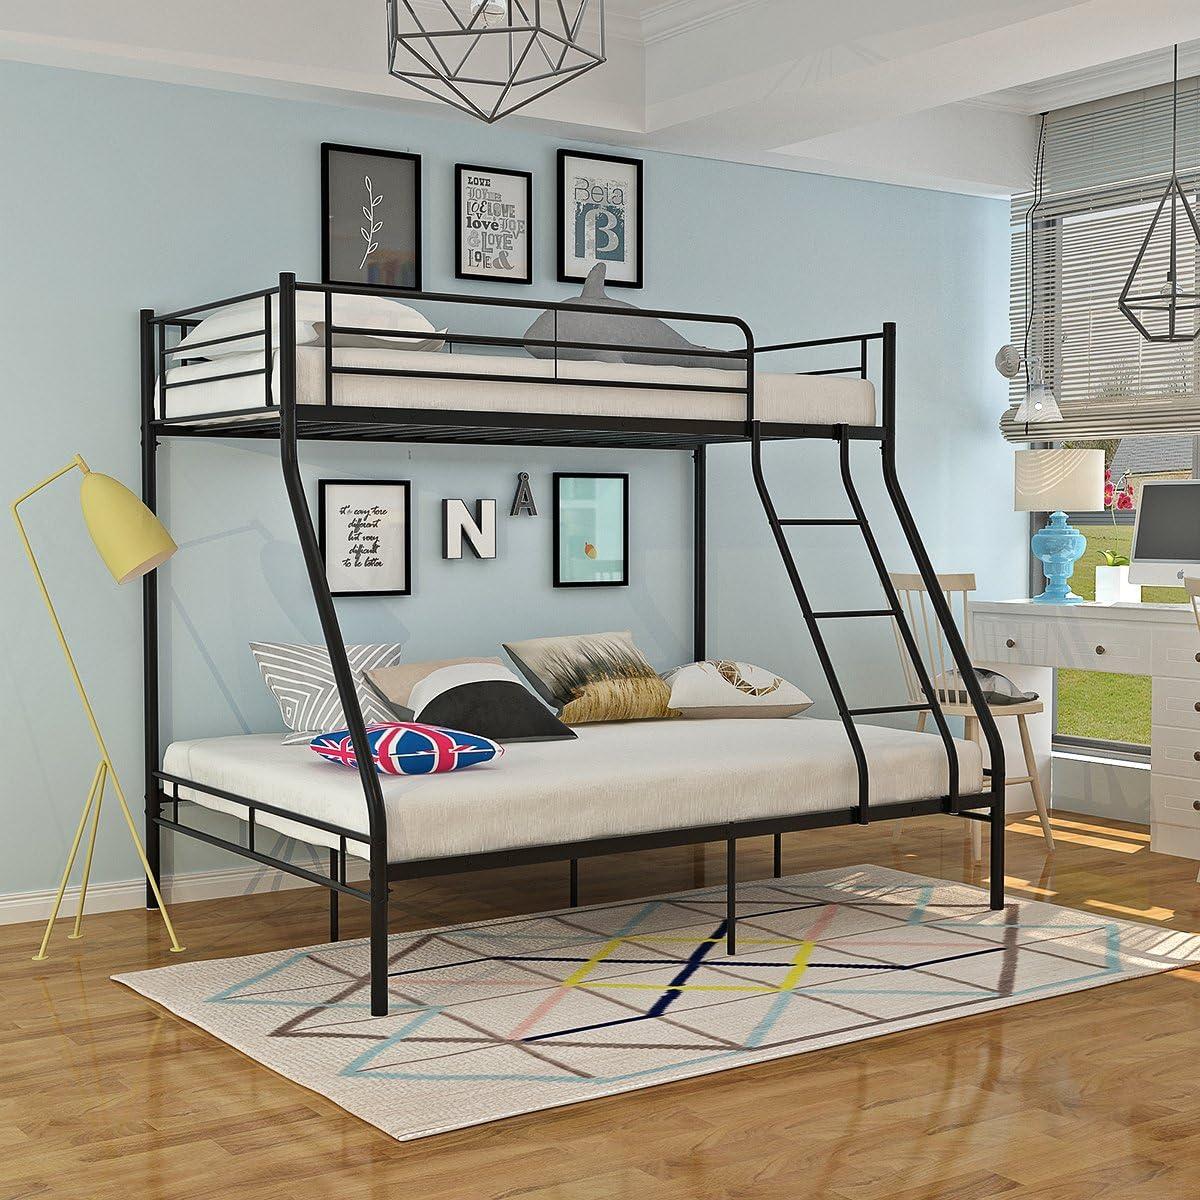 Panana Triple 3 Sleeper Metal Bunk Bed Top Single Bed Bottom Double Bed For Children Kids Bedroom Black Amazon Co Uk Kitchen Home